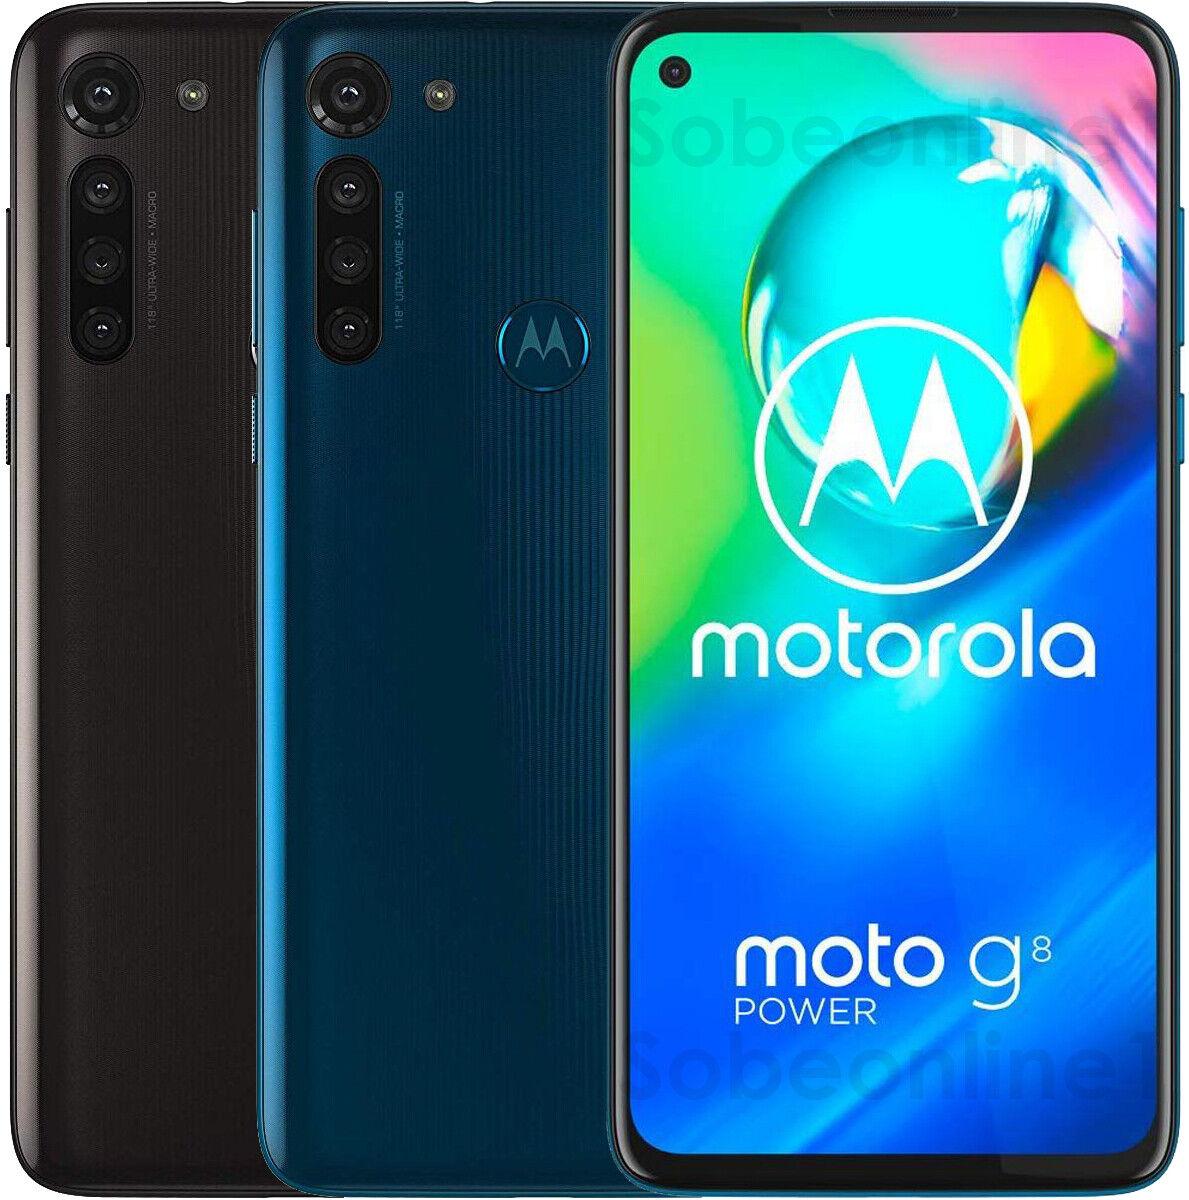 Motorola Moto G8 Power 64GB 4GB RAM XT2041-1 (FACTORY UNLOCKED) 6.4